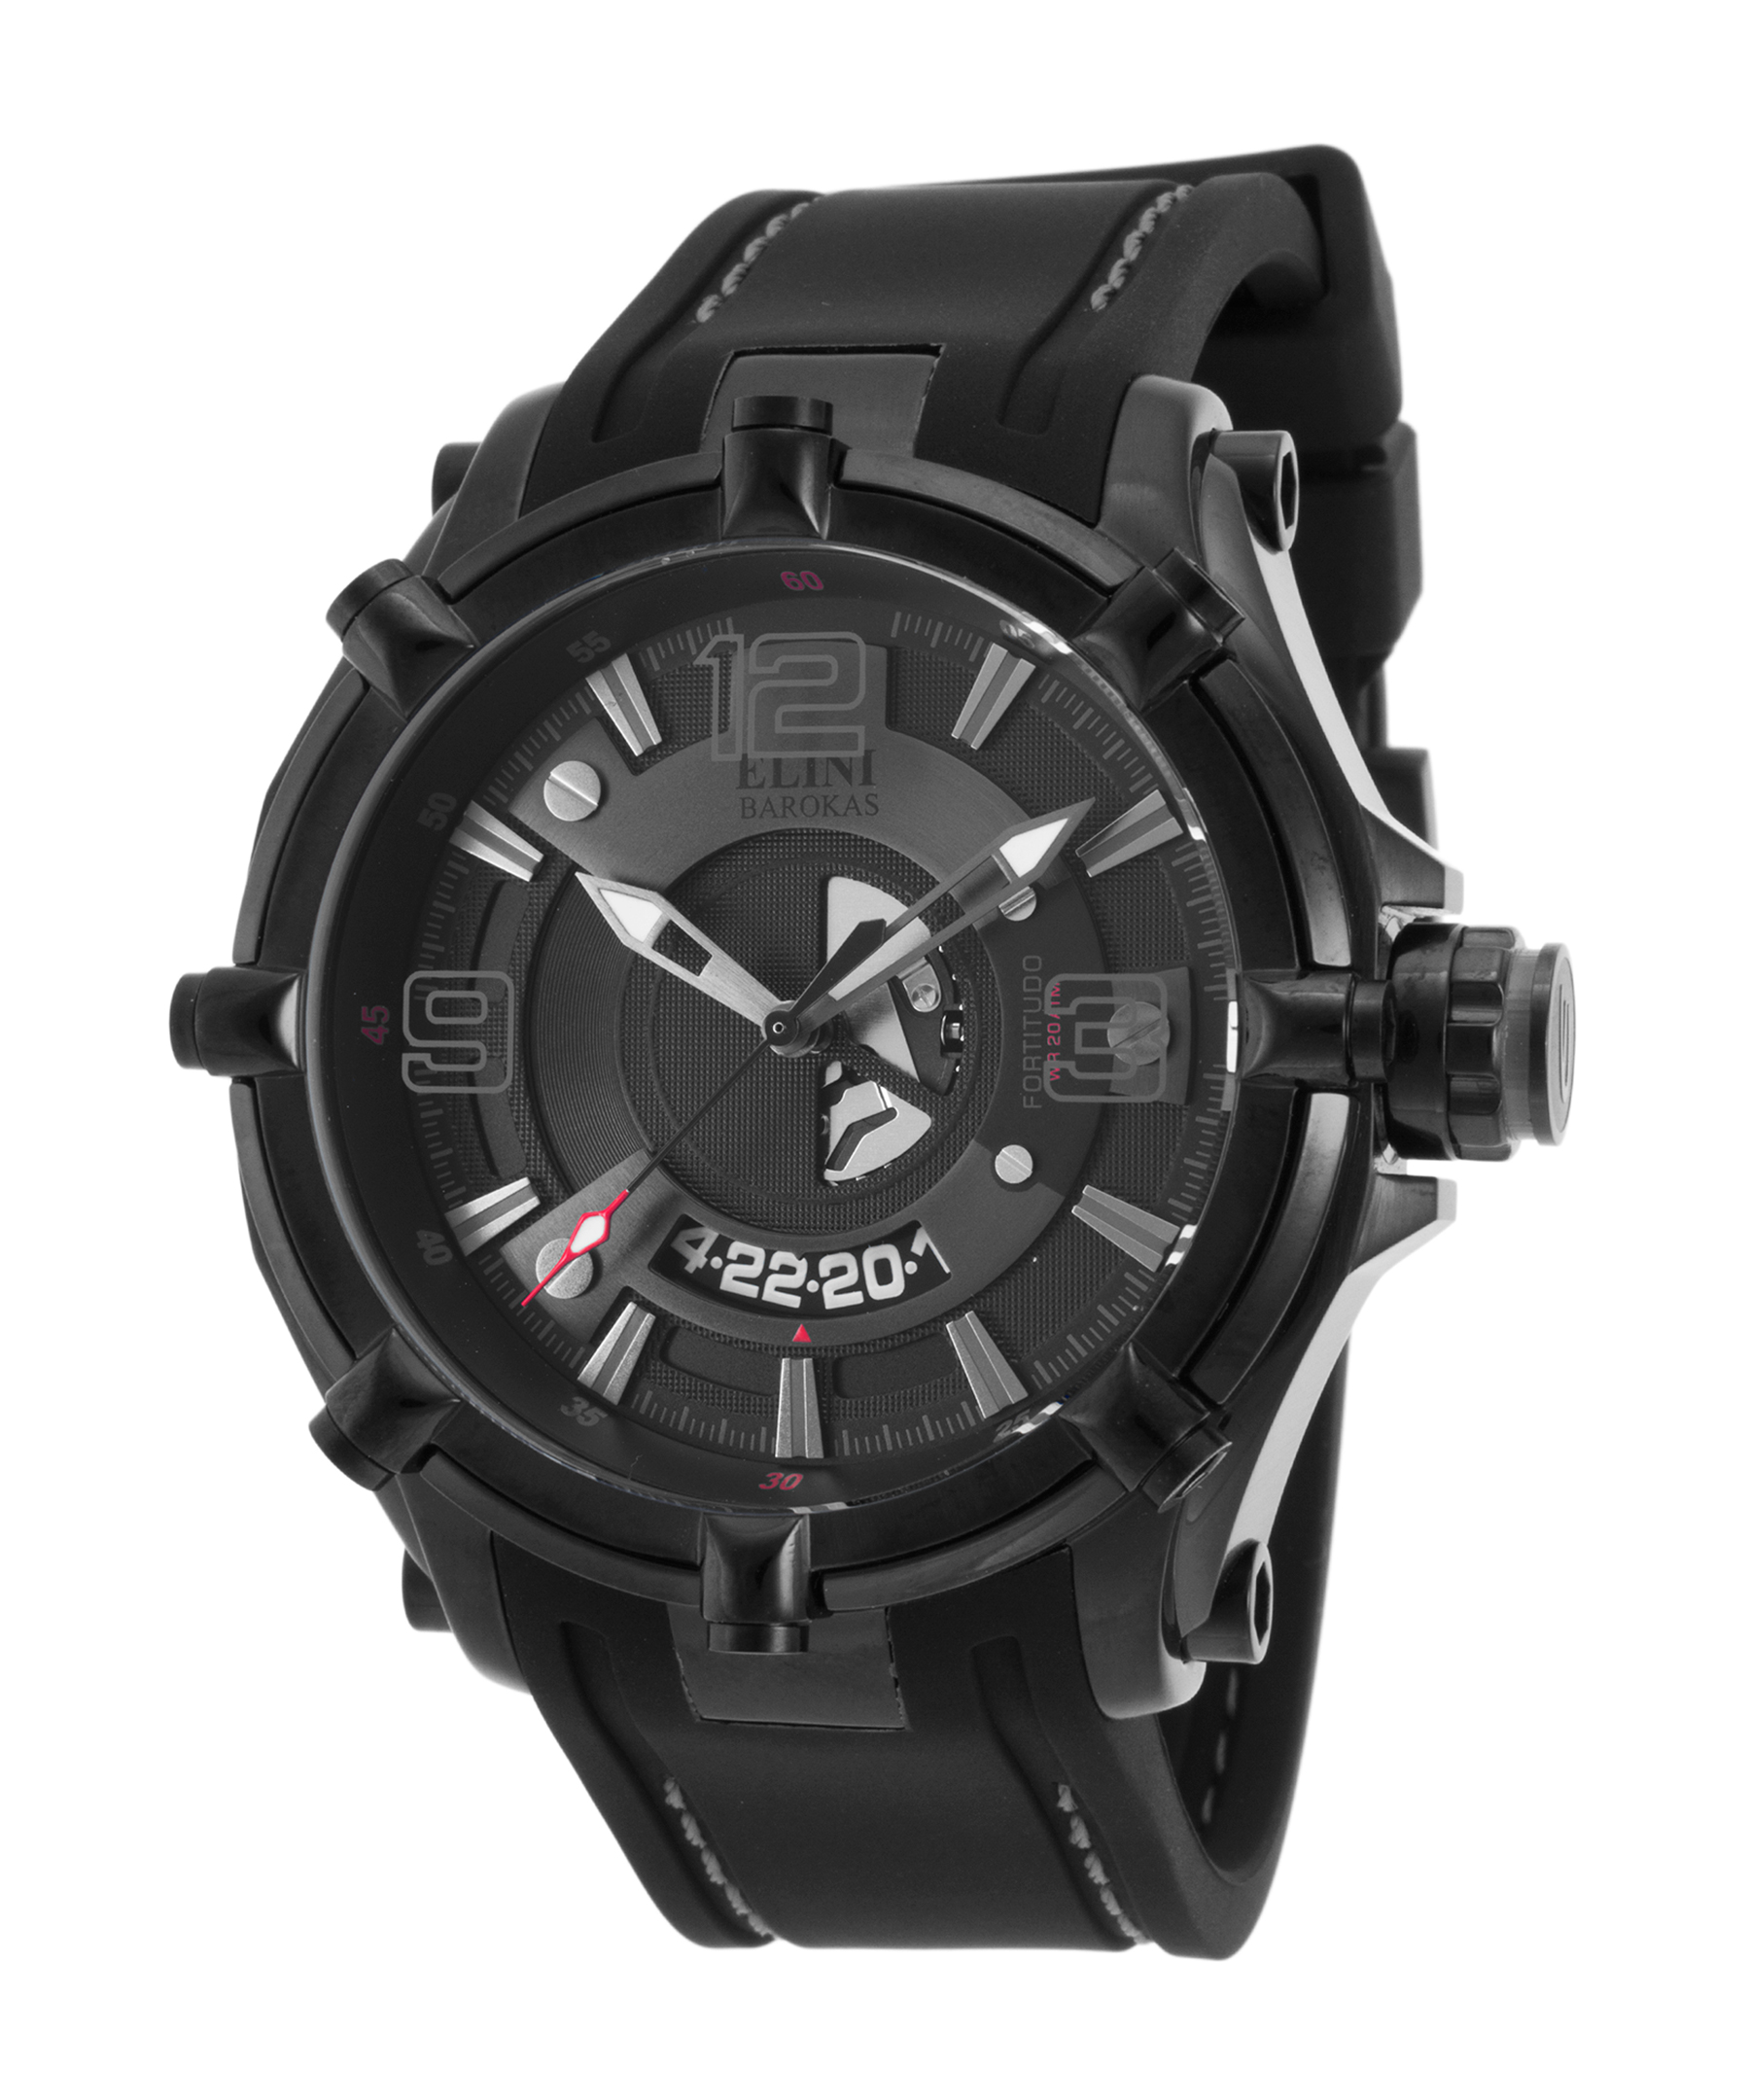 Elini Barokas 20000-Bb-01-Grya Fortitudo Duo Black Silicone Dark Grey And Black Dial Watch